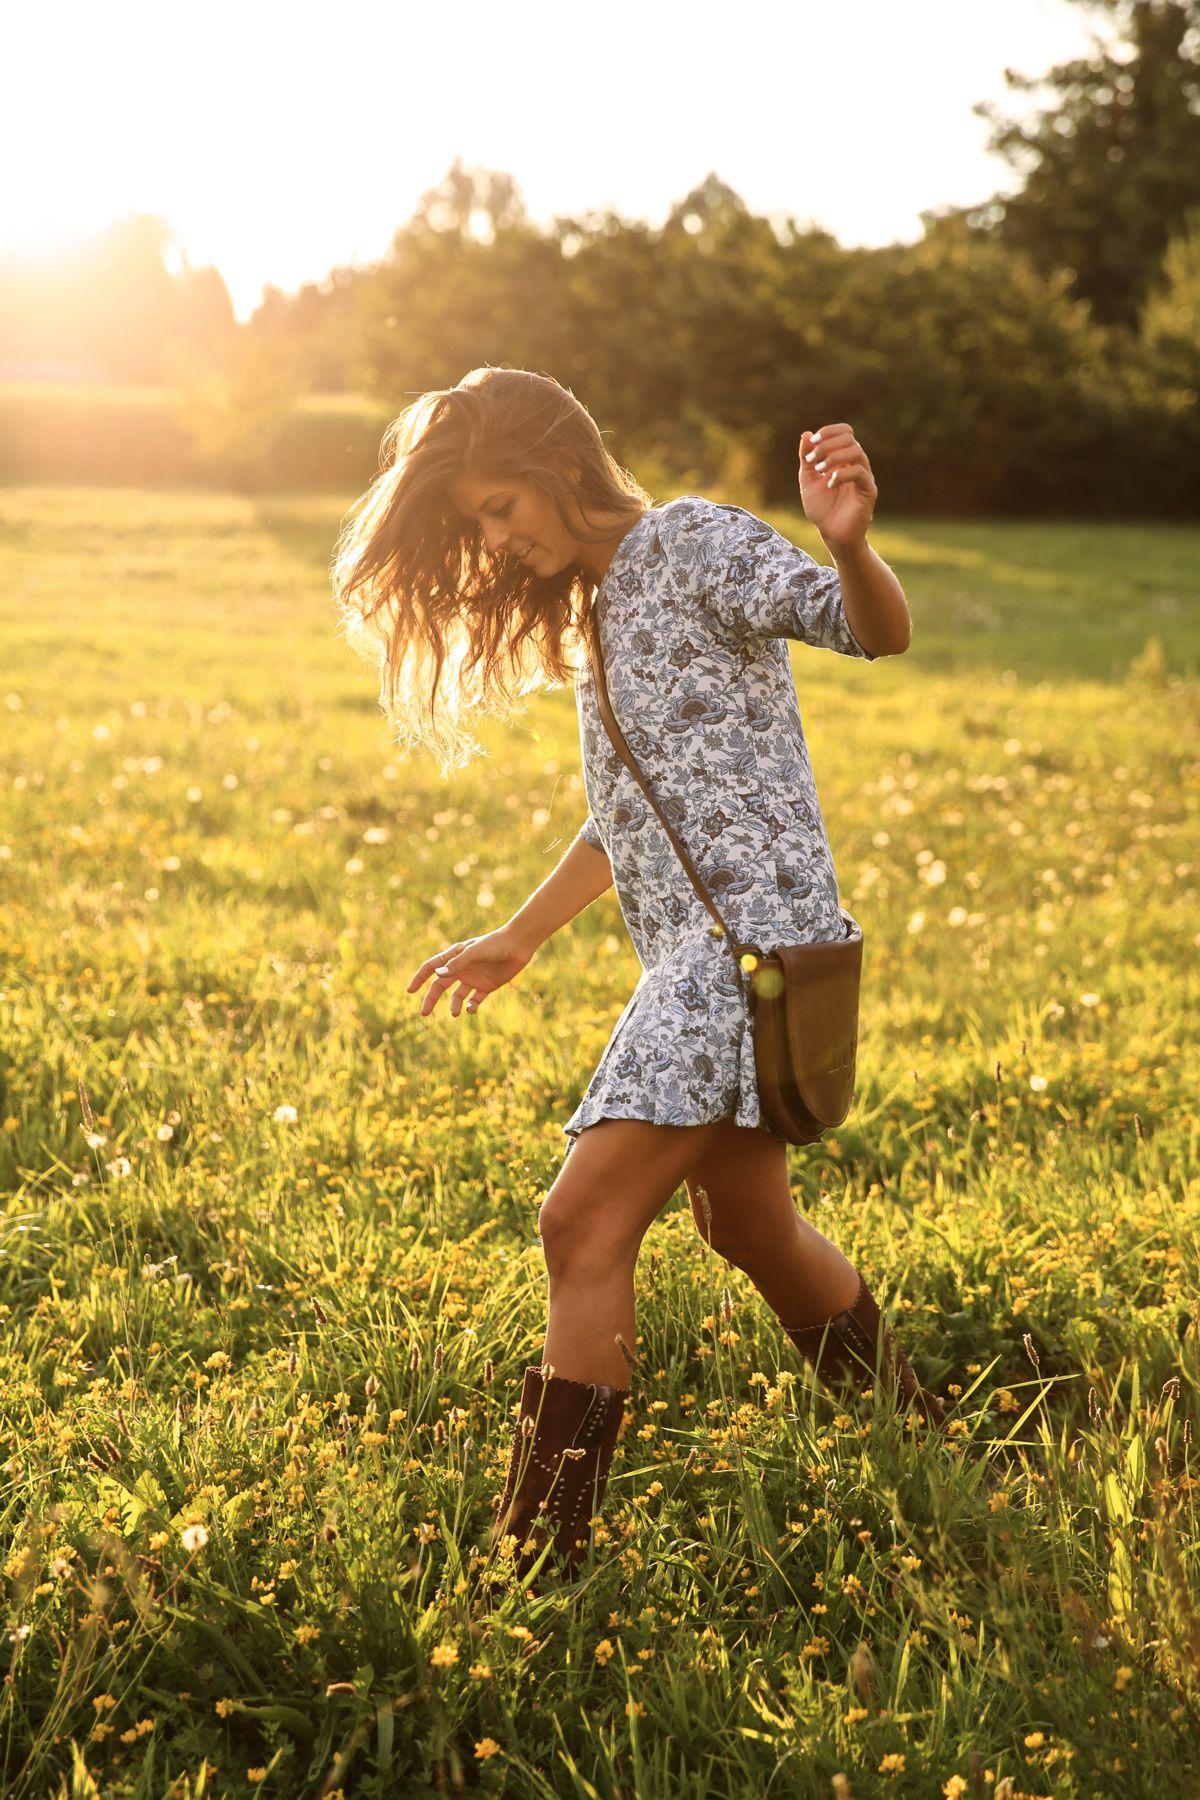 trendy_taste-look-outfit-street_style-ootd-blog-blogger-fashion_spain-moda_españa-cowboy-campero-sendra-cowboy_boots-botas_camperas-loewe-bag-bolso-vestido_flores-flower_print-dress-13